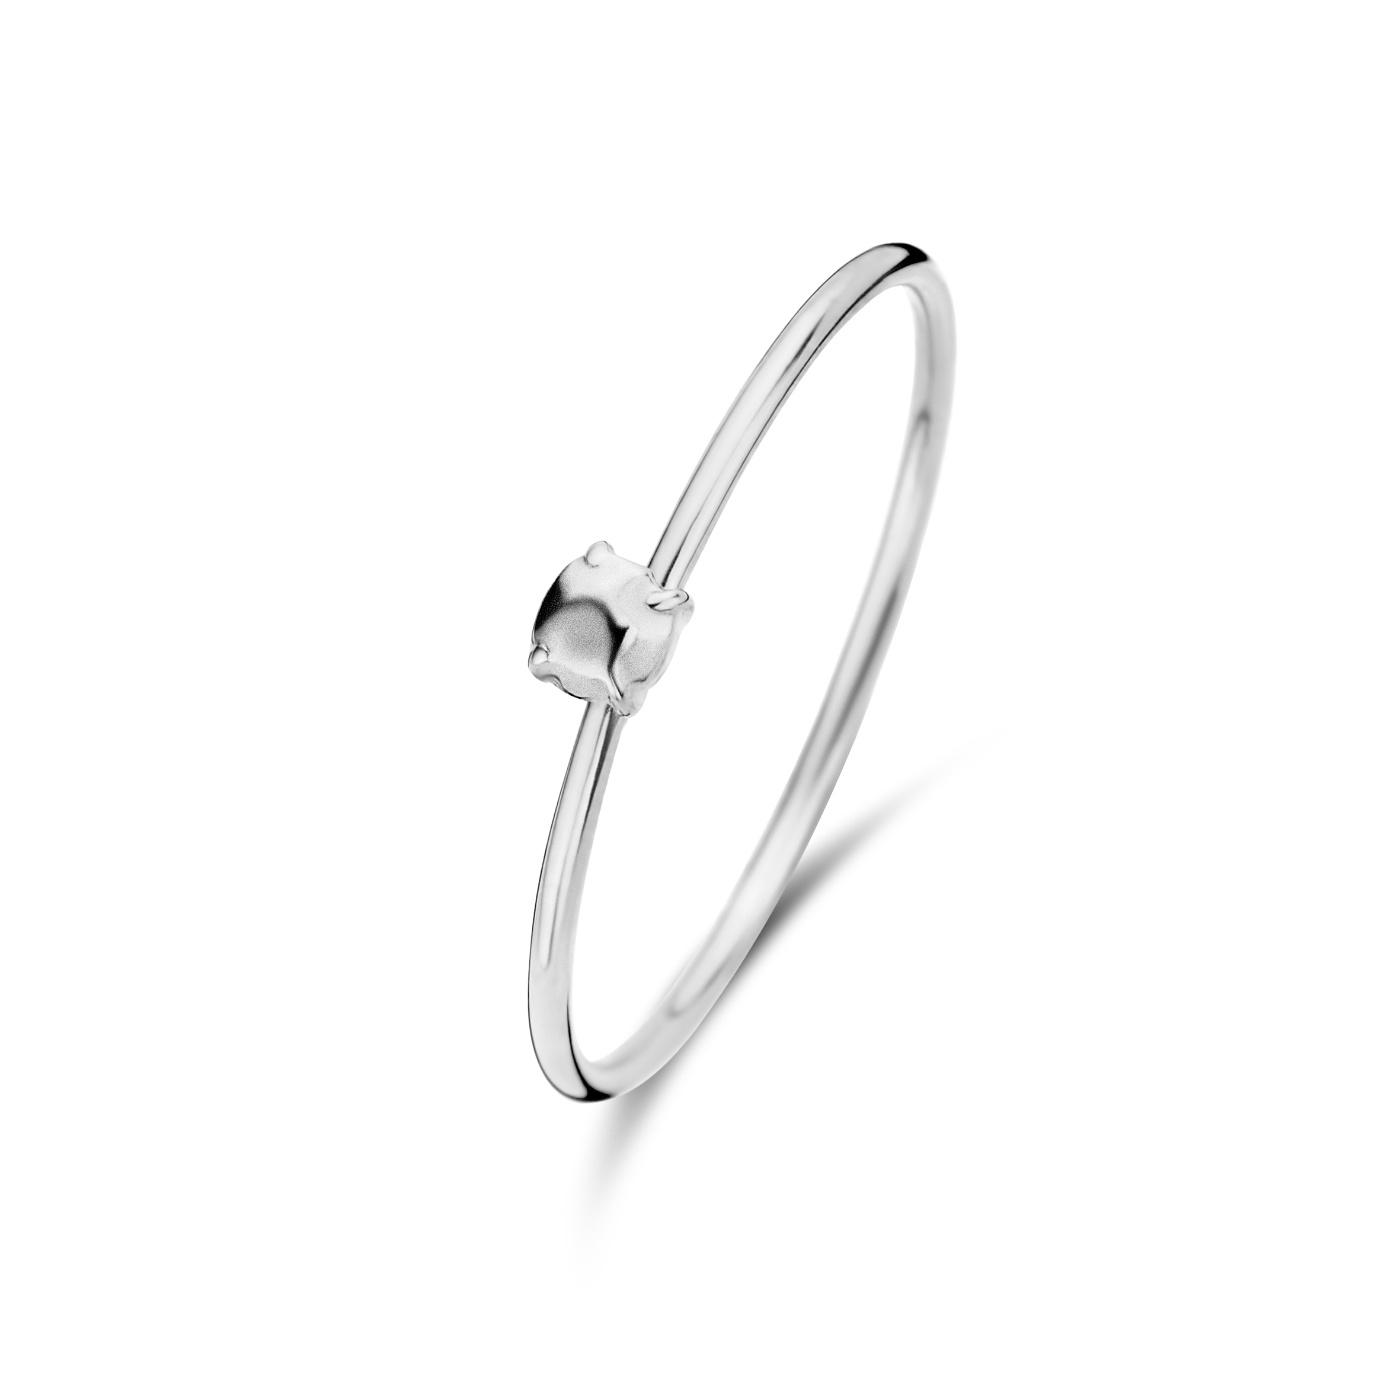 Violet Hamden Sisterhood Stone 925 Sterling Silber Ring mit Stein